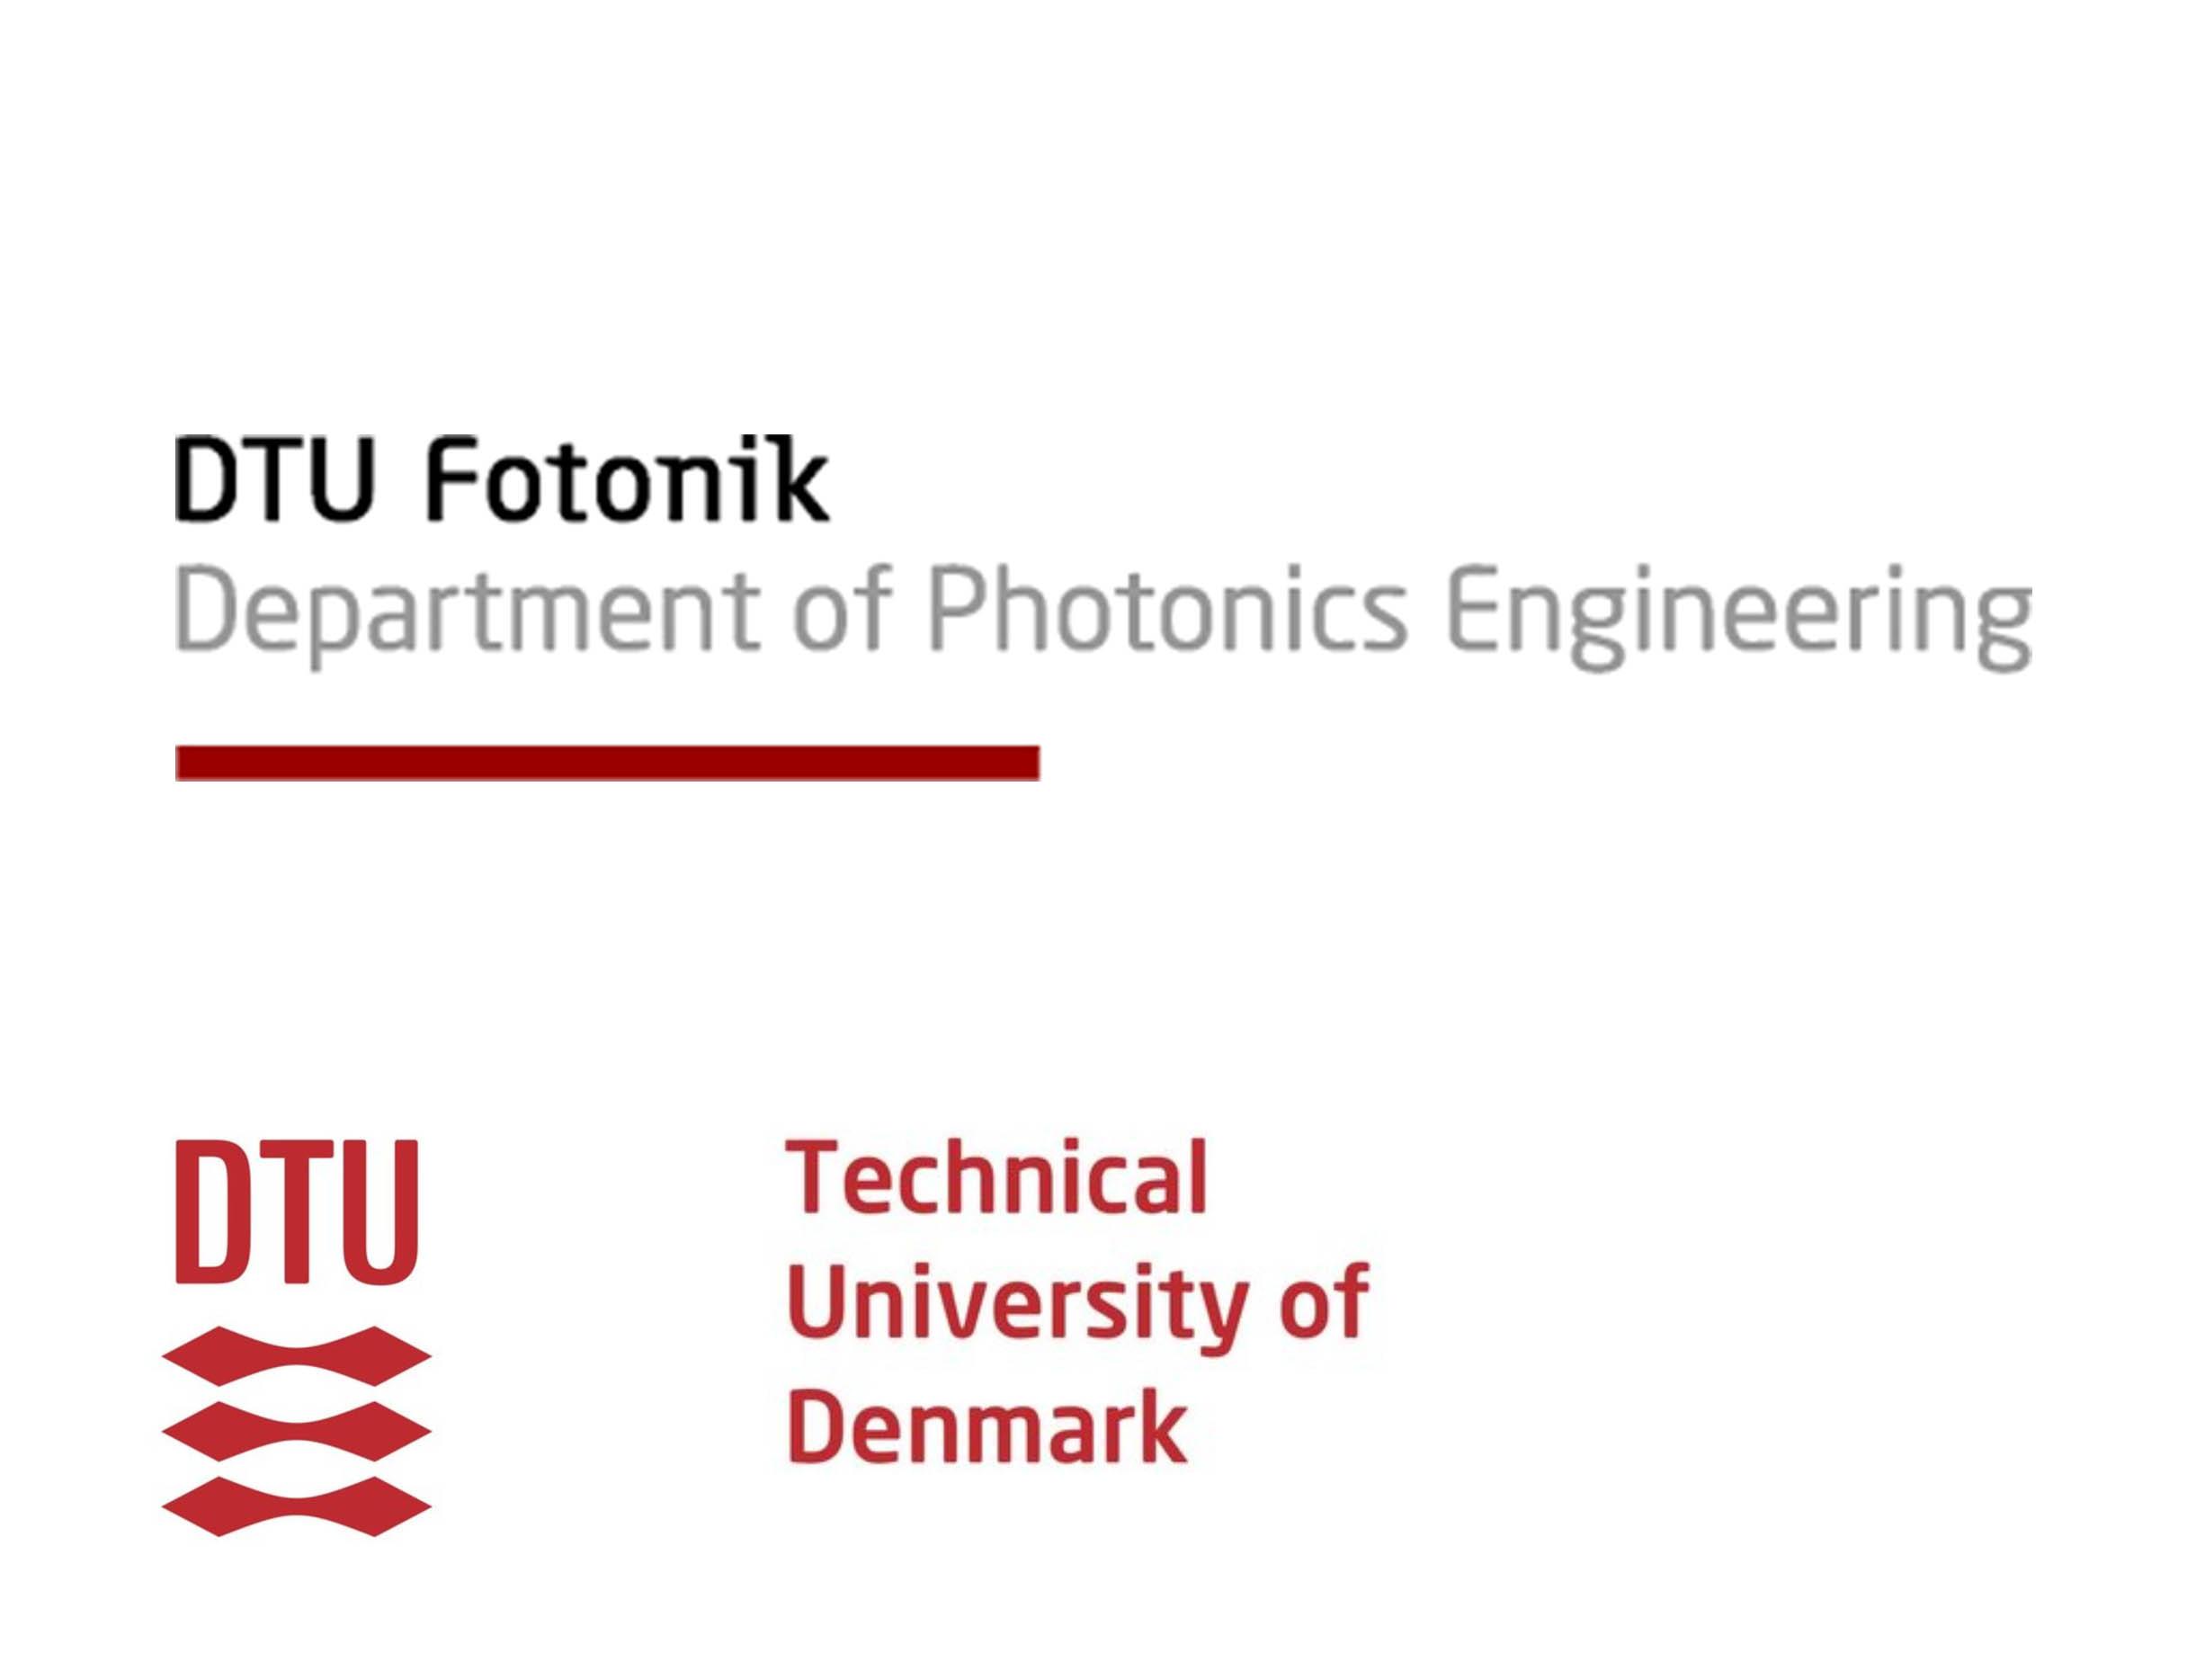 DTU Fotonik logo